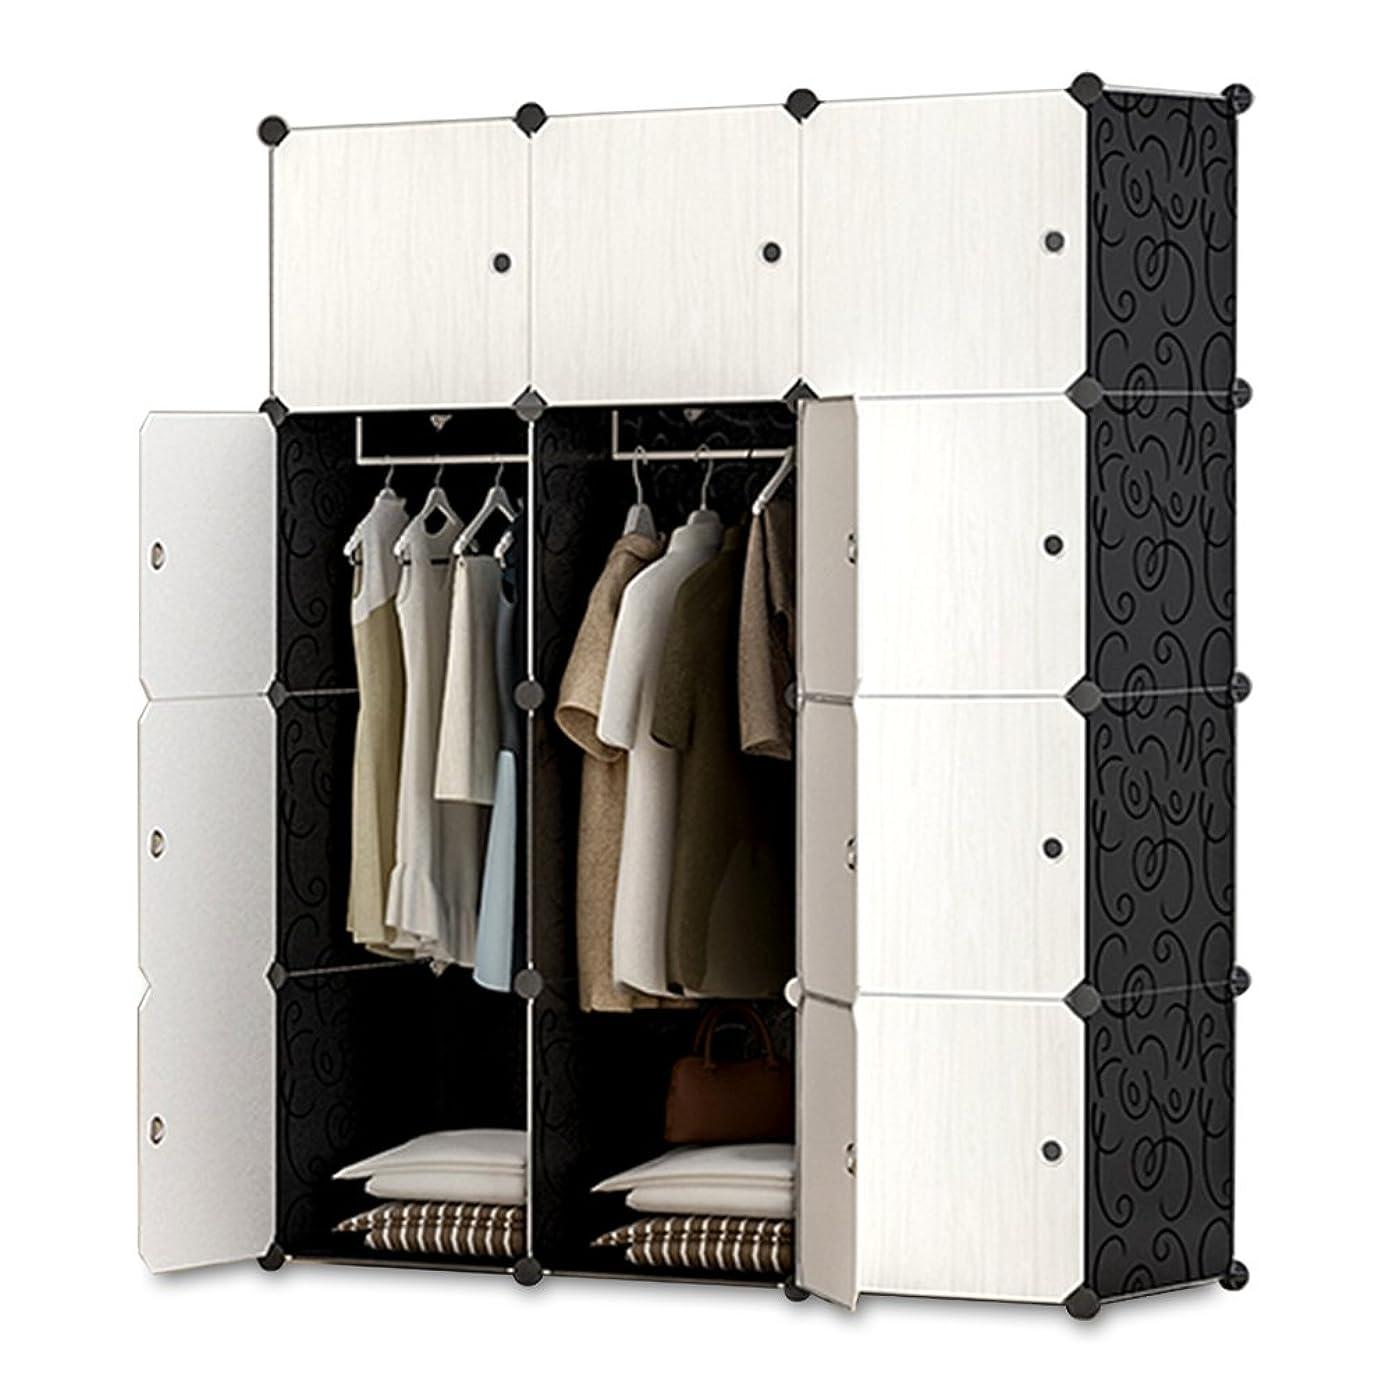 札入れ蒸気博覧会iOCHOW ワードローブ 105x45x140cm 四段階 北欧風 収納ケース 衣類 環境保護樹脂 耐久性 鉄筋の骨組 耐荷重